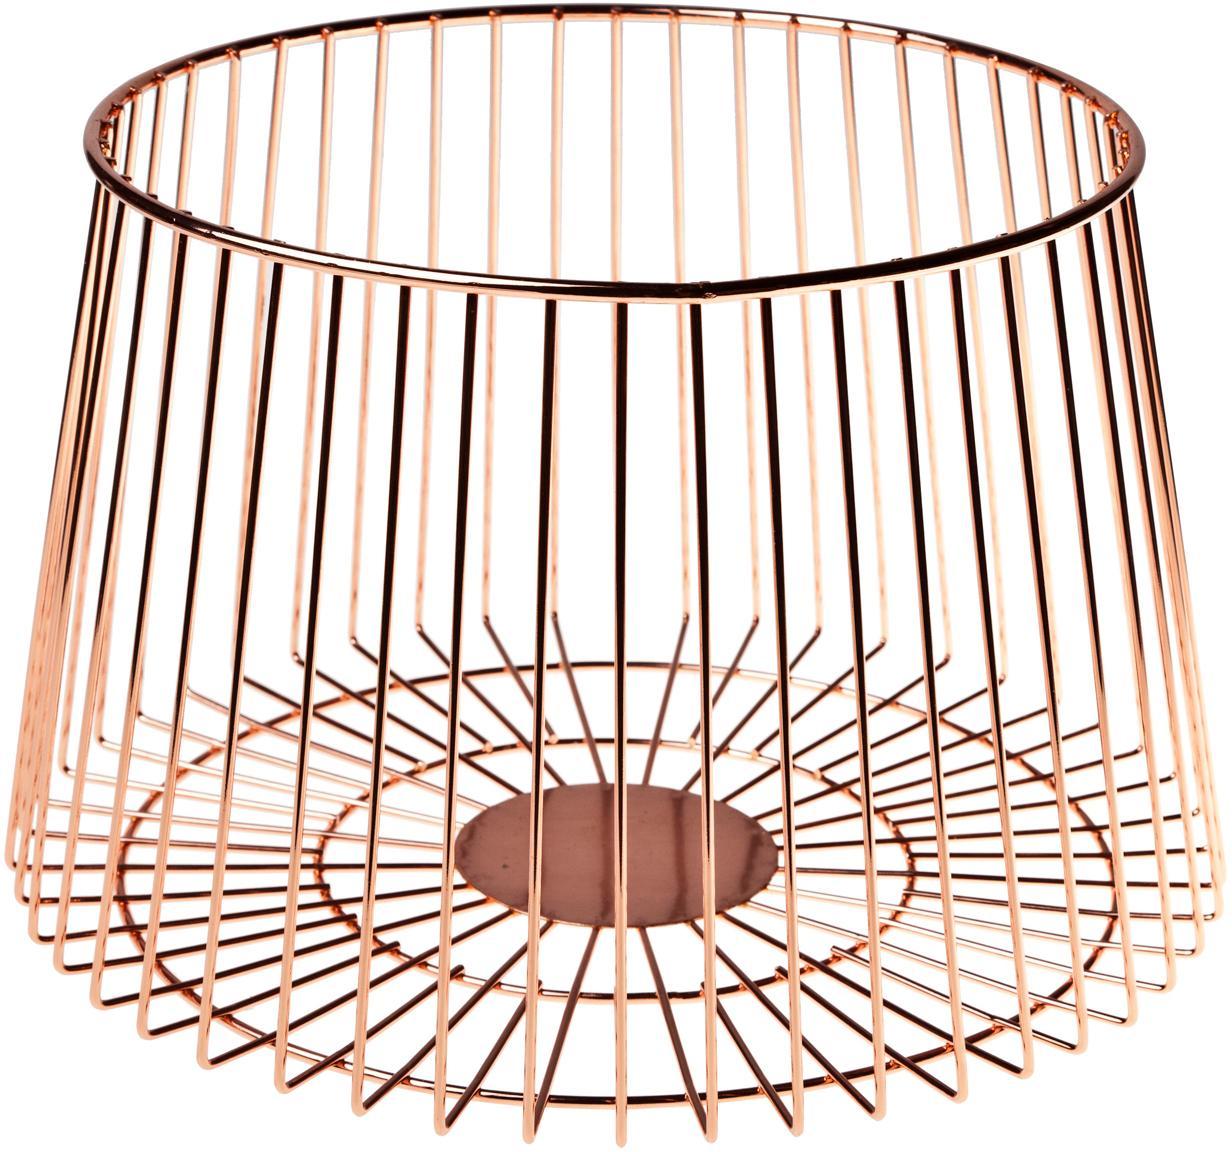 Cesta Basket, Acero inoxidable recubierto, Color bronce, Ø 24 x Al 16 cm